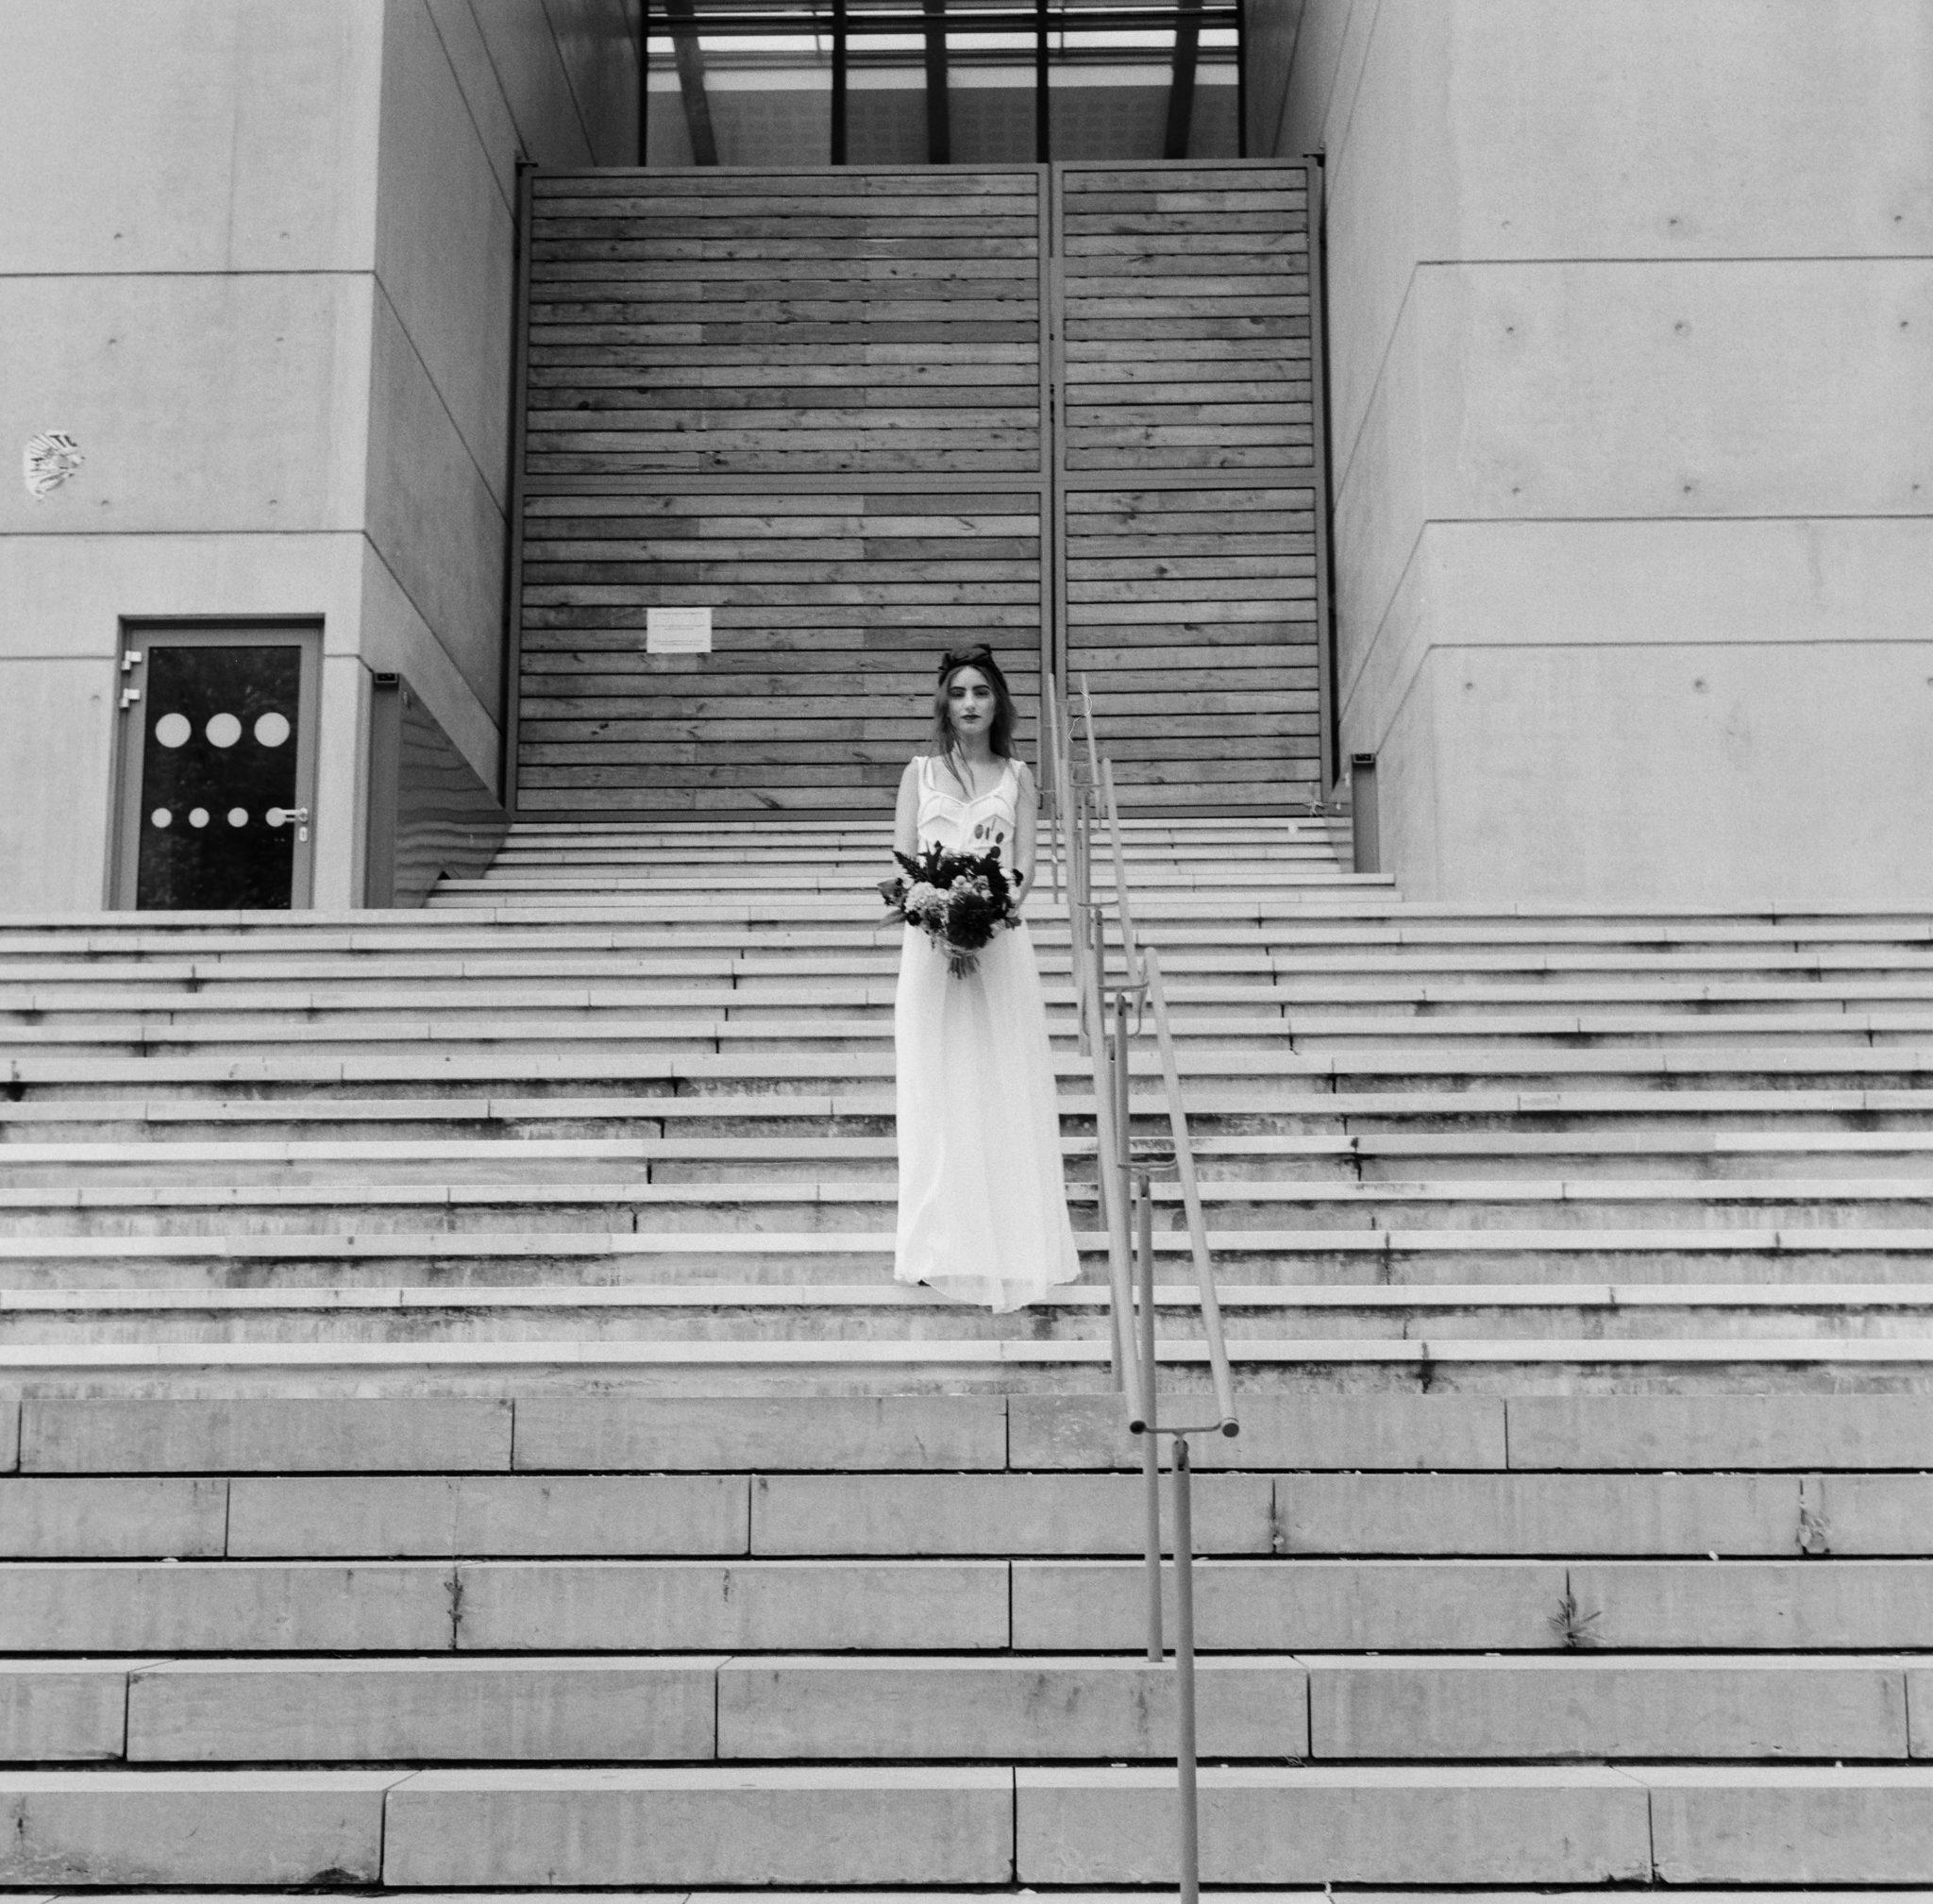 Le Wedding Urban Brides robe L'amoureuse by Ingrid Fey bandeau jennifer Behr chez Suzanne Ceremony Presqu'îleCaen